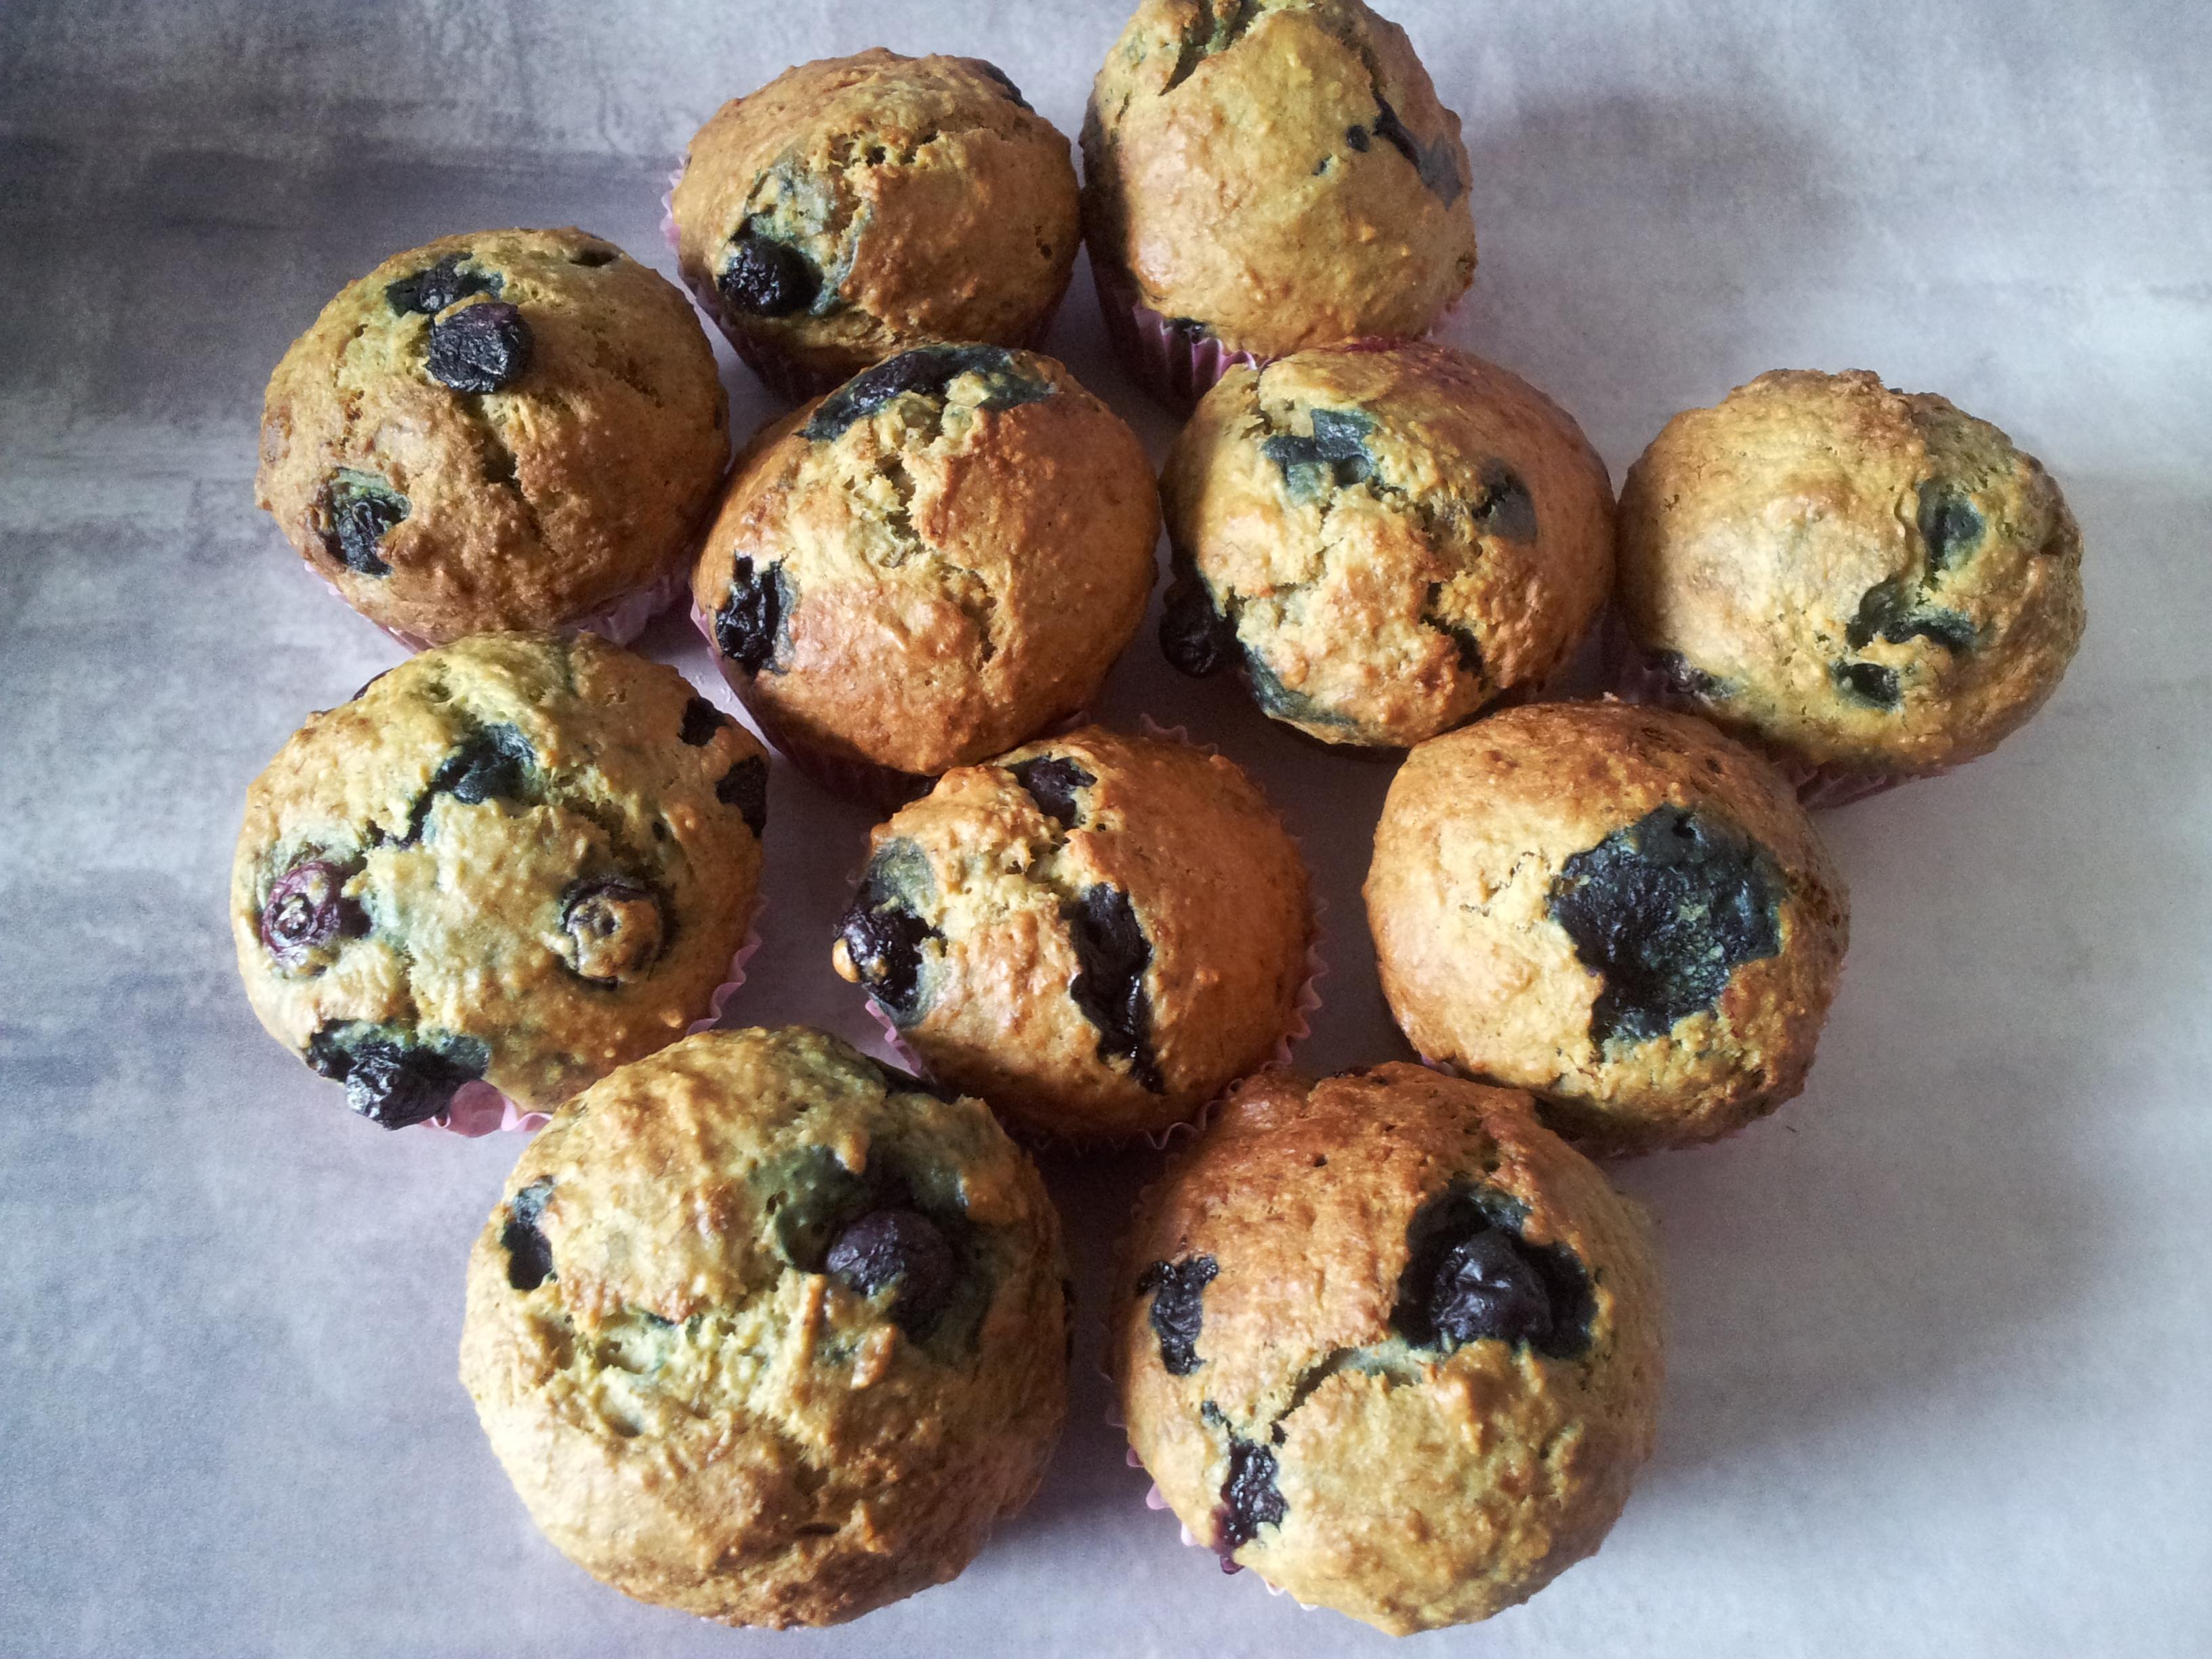 Næsten Sund Kage Bananblåbær Muffins Dahls Delicious Dahl